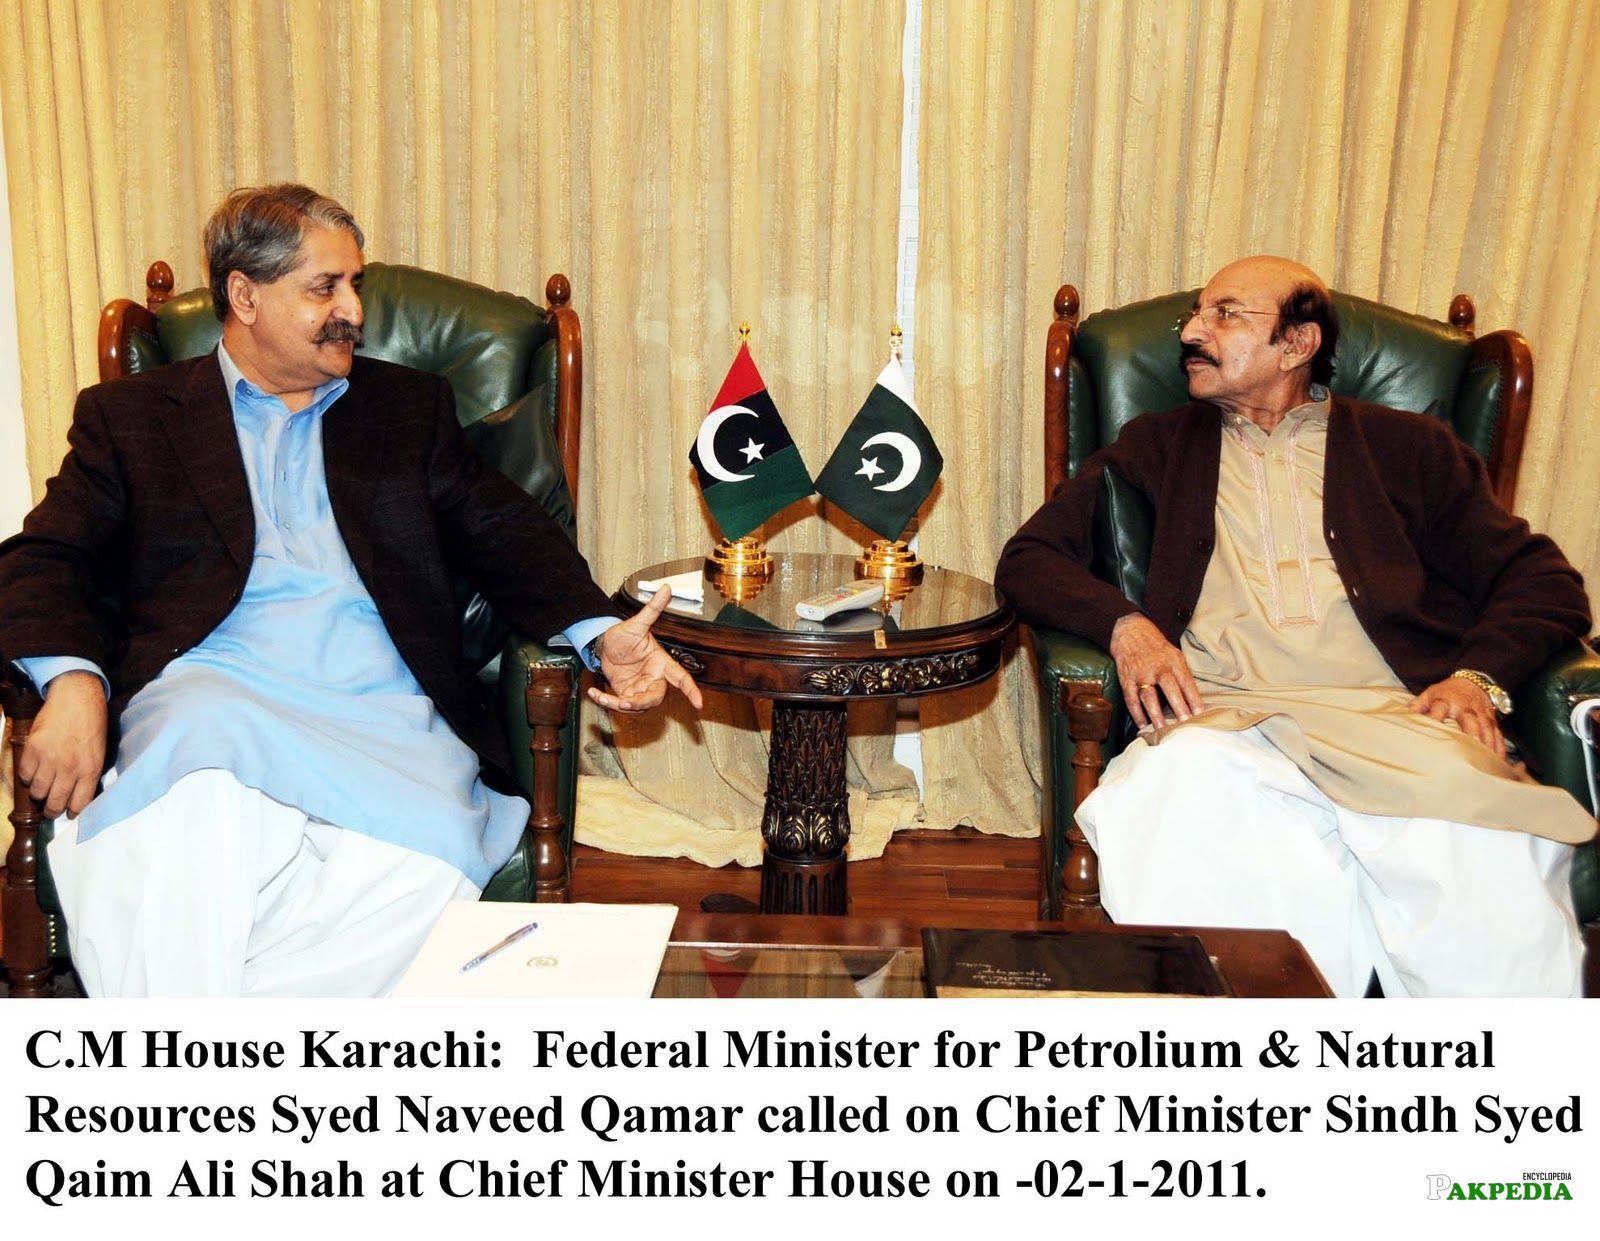 With Syed Naveed Qamar